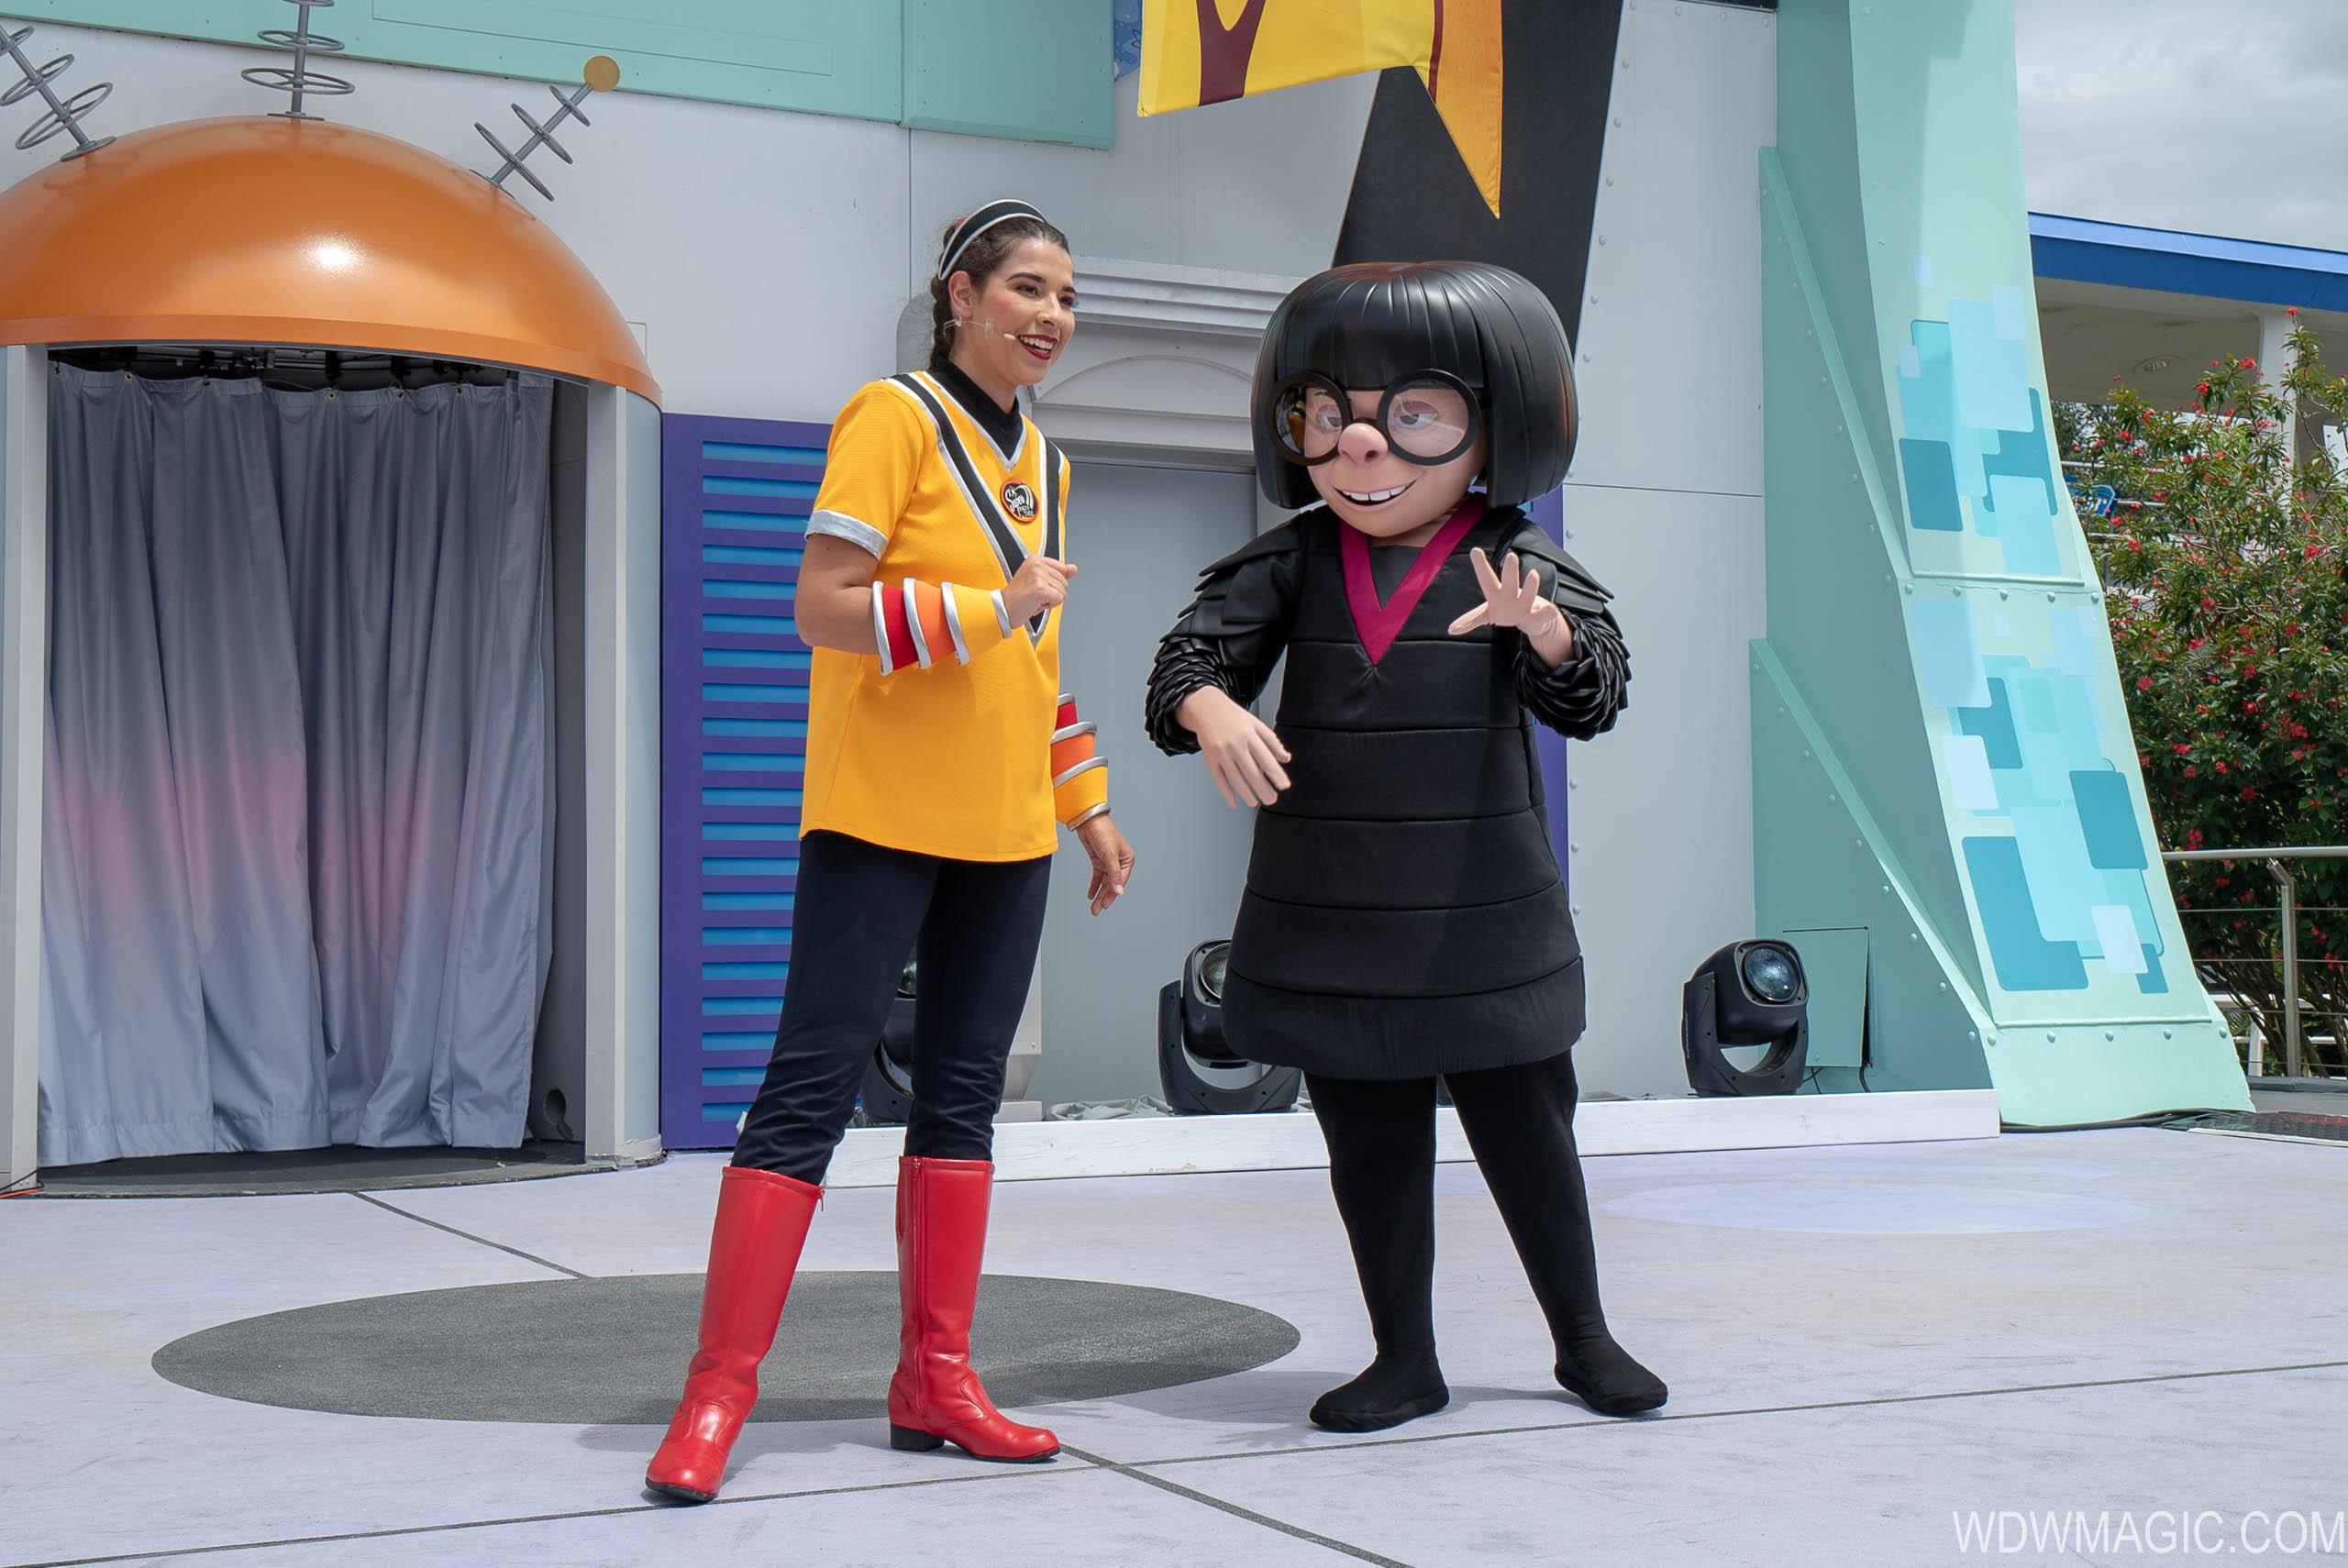 Edna Mode at the Magic Kingdom